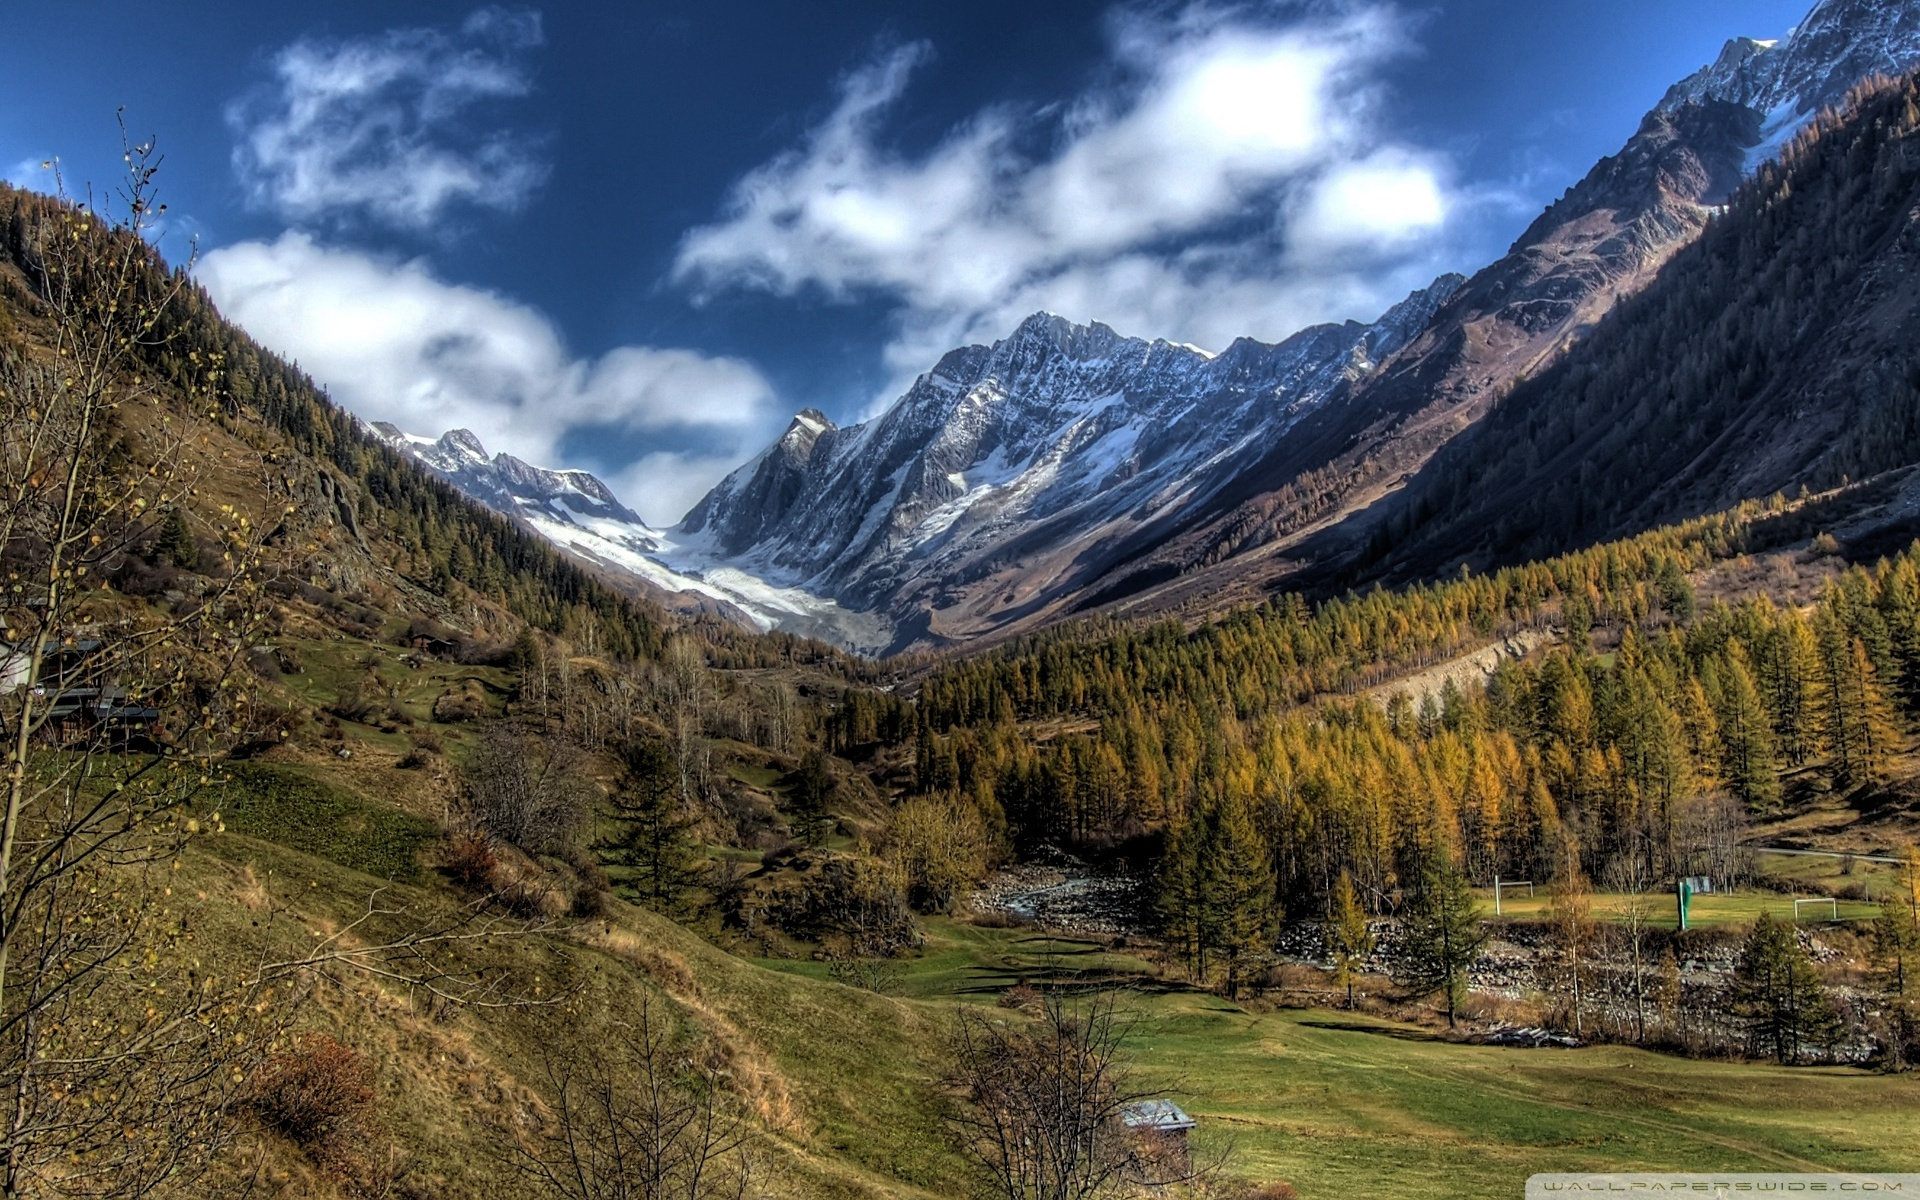 Free Mountainscape Wallpaper 33211 2560x1600 px